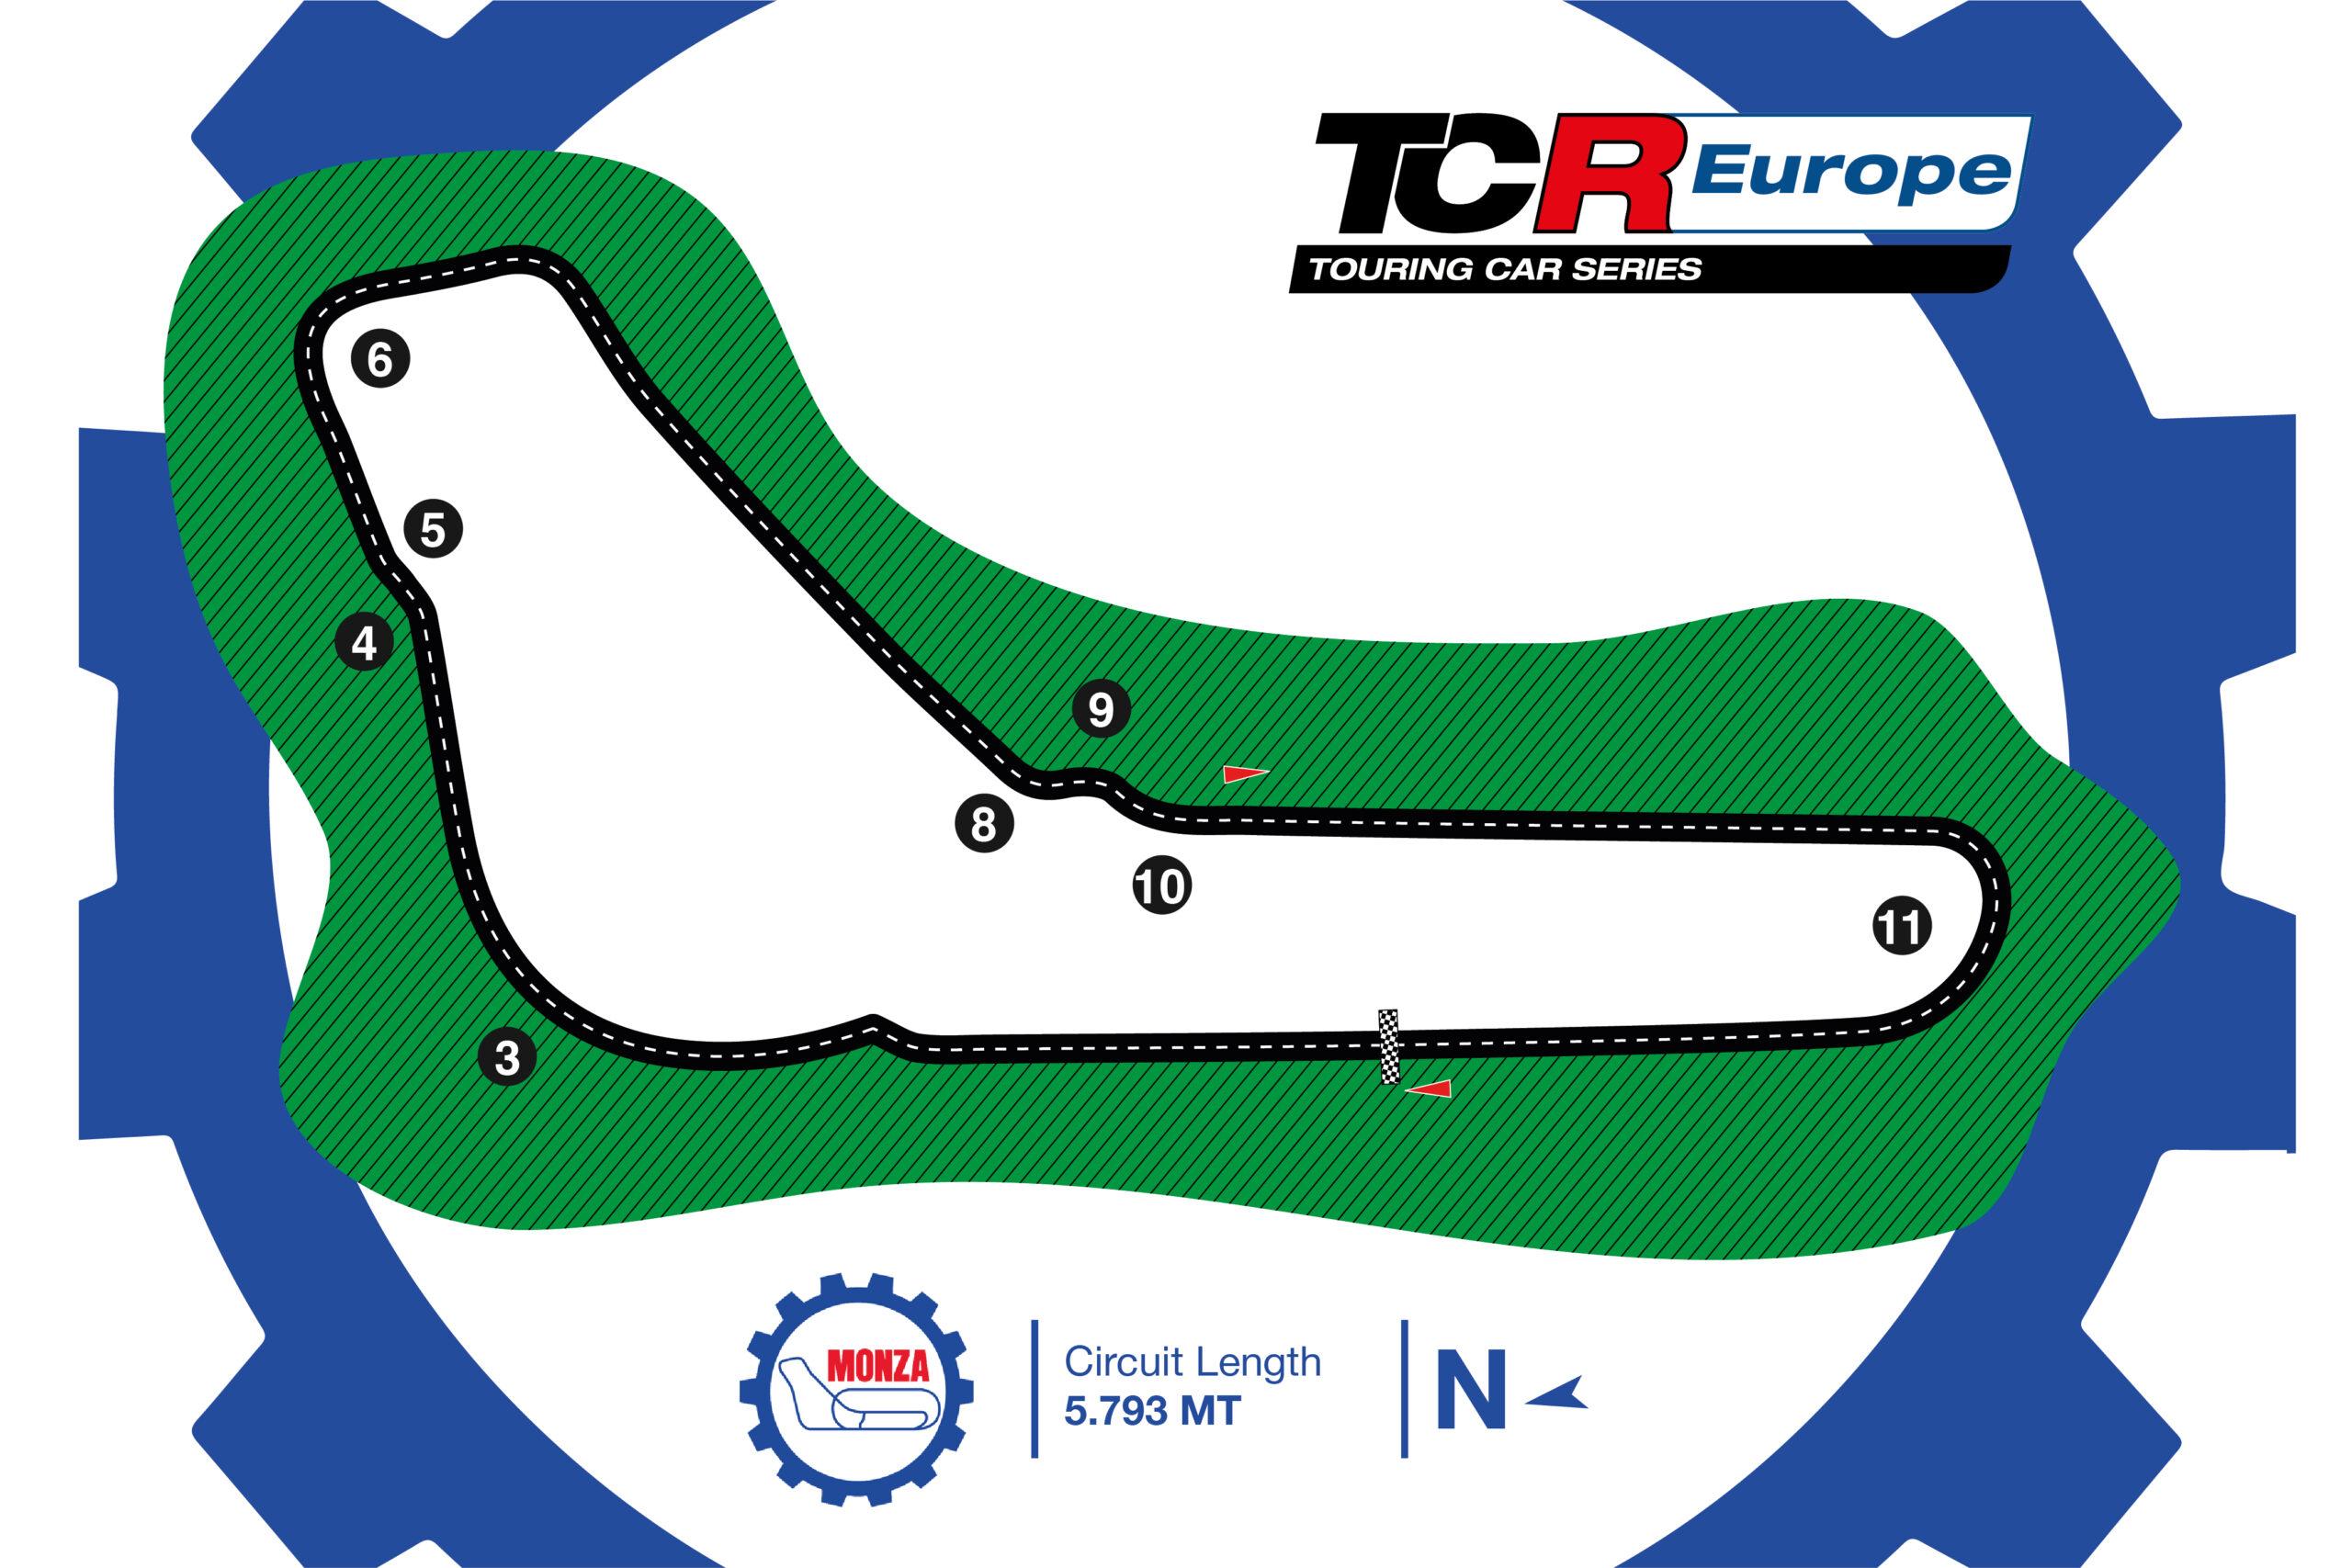 2021_Europe_Tracks_06_Monza_1055a46f26f5af0ed3f8497cab82c9c0